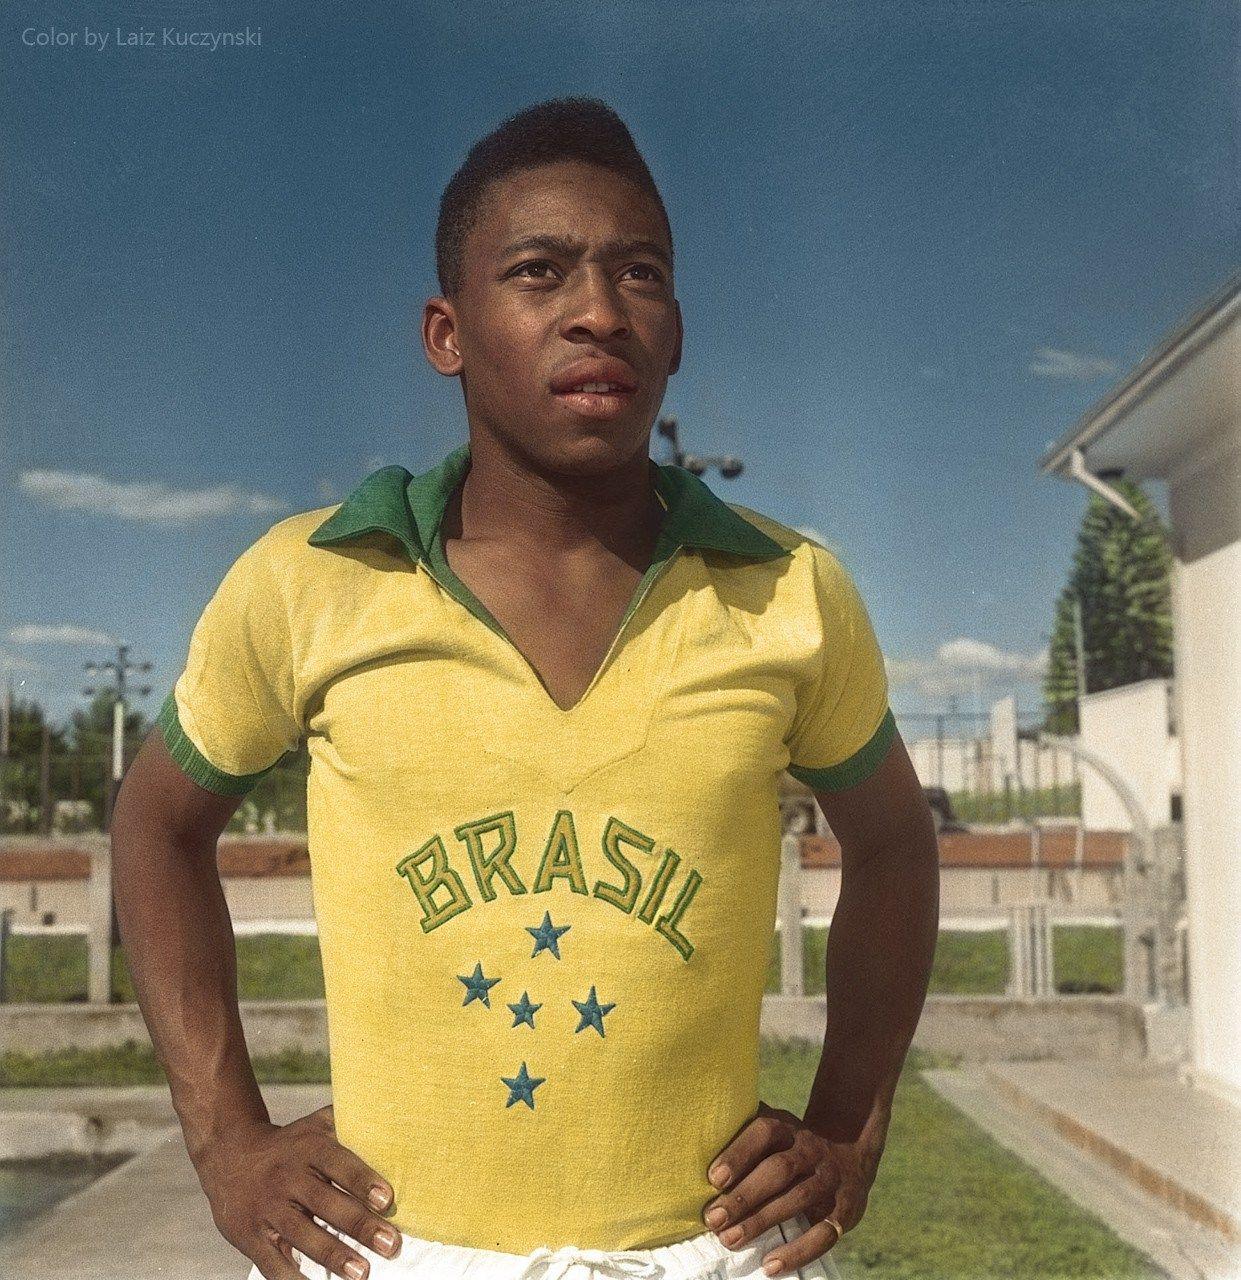 Legends Original Inside Sports: Top 9 Football Legends Of All Times